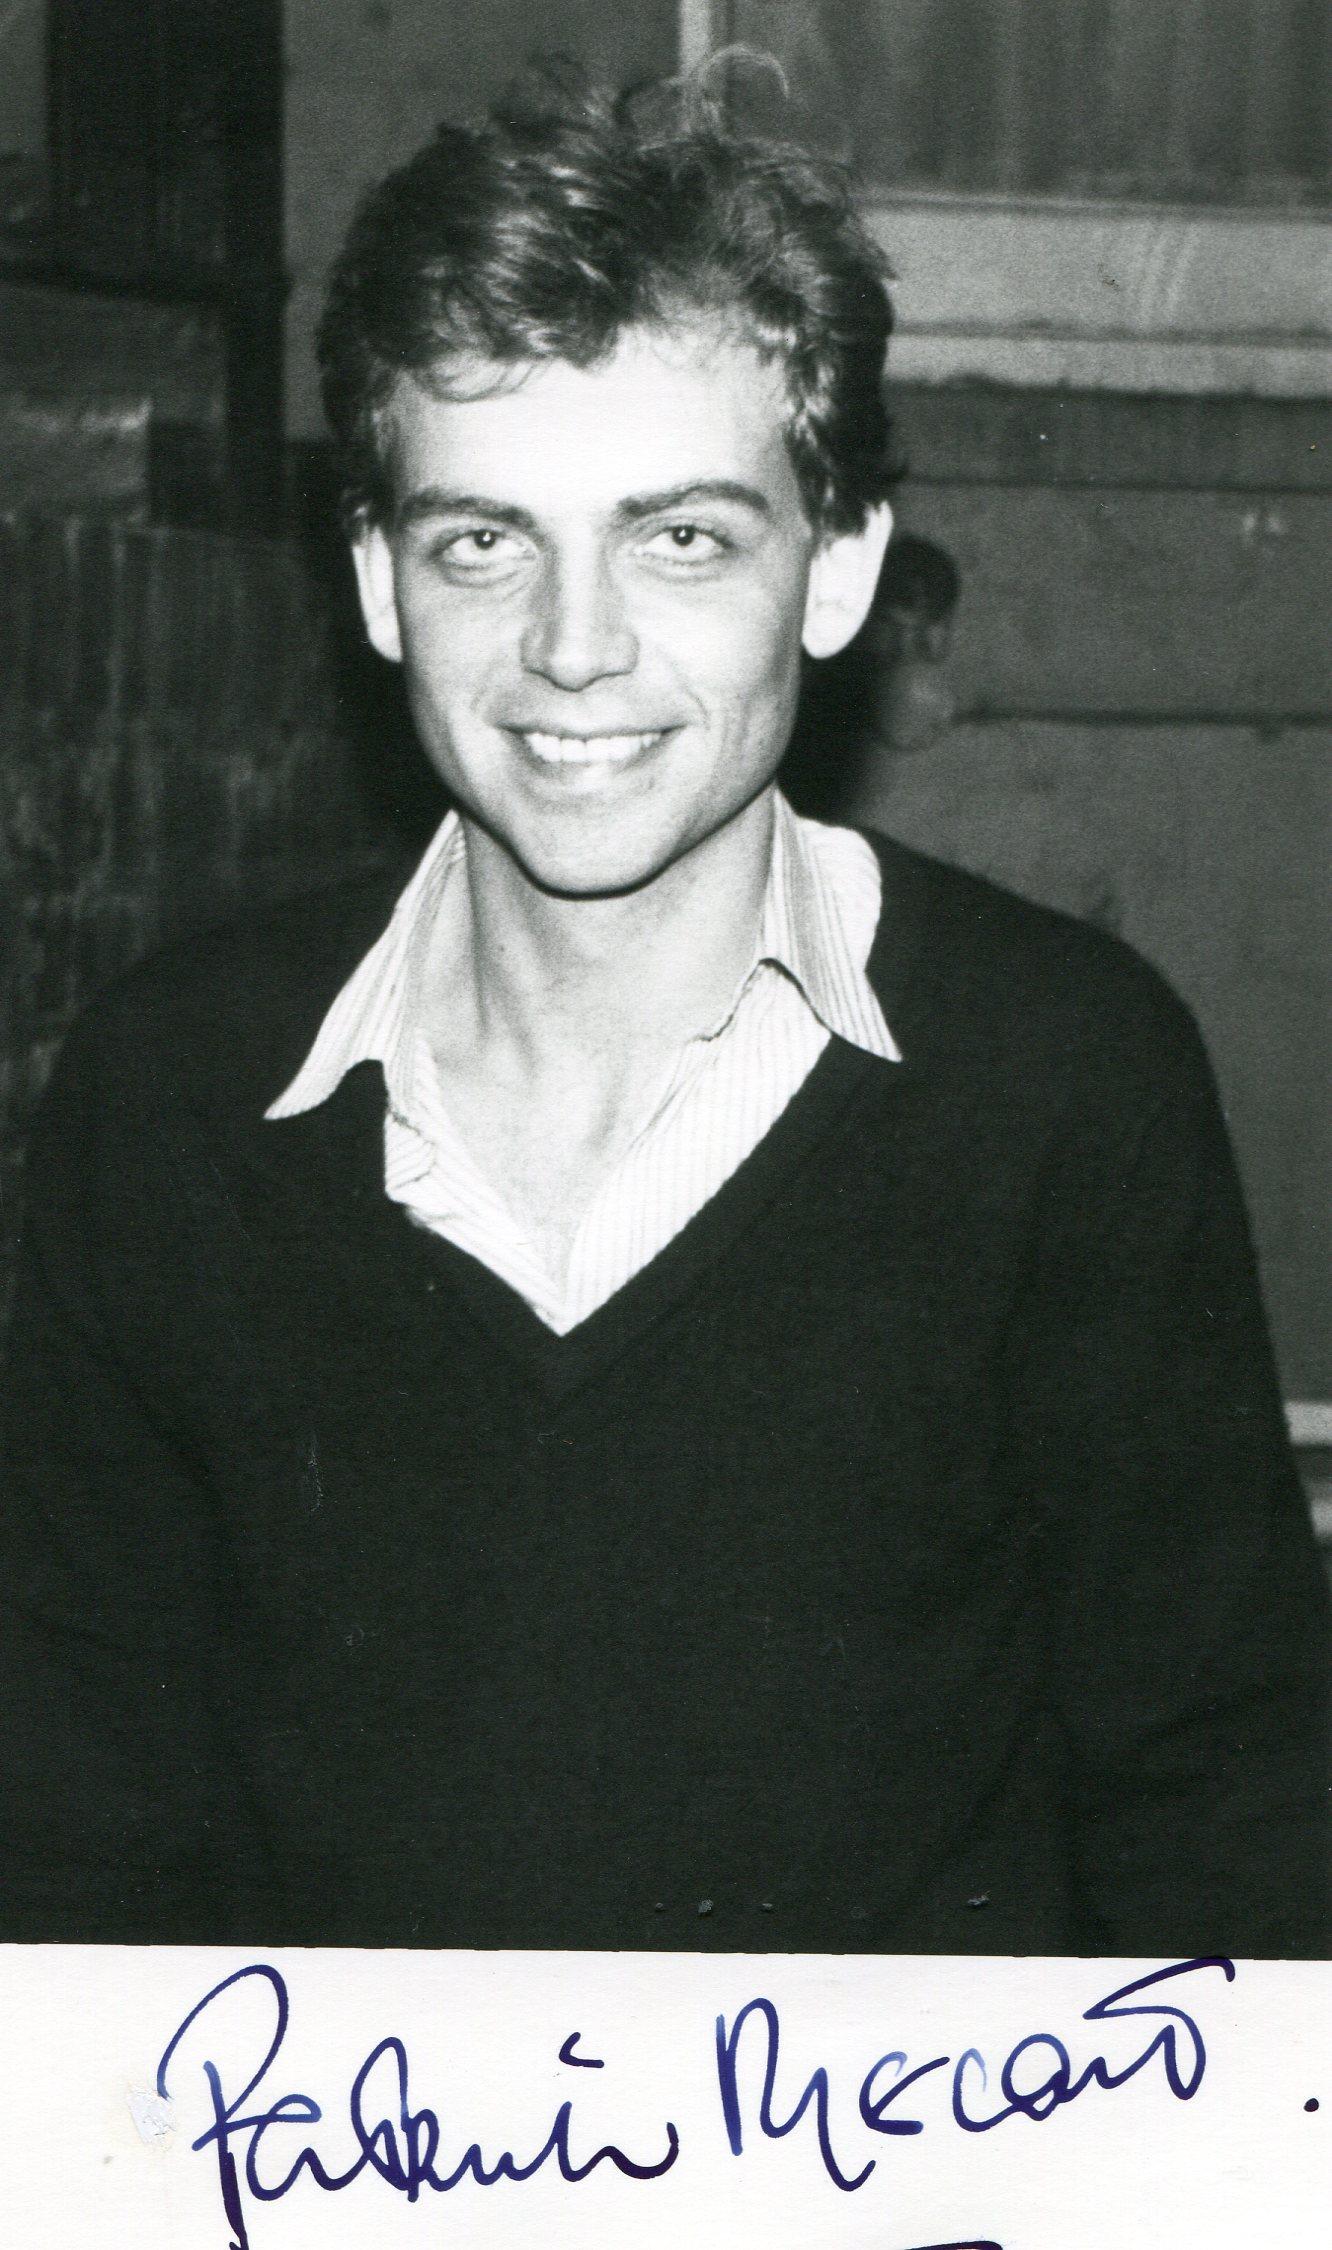 Patrick Ryecart (born 1952)